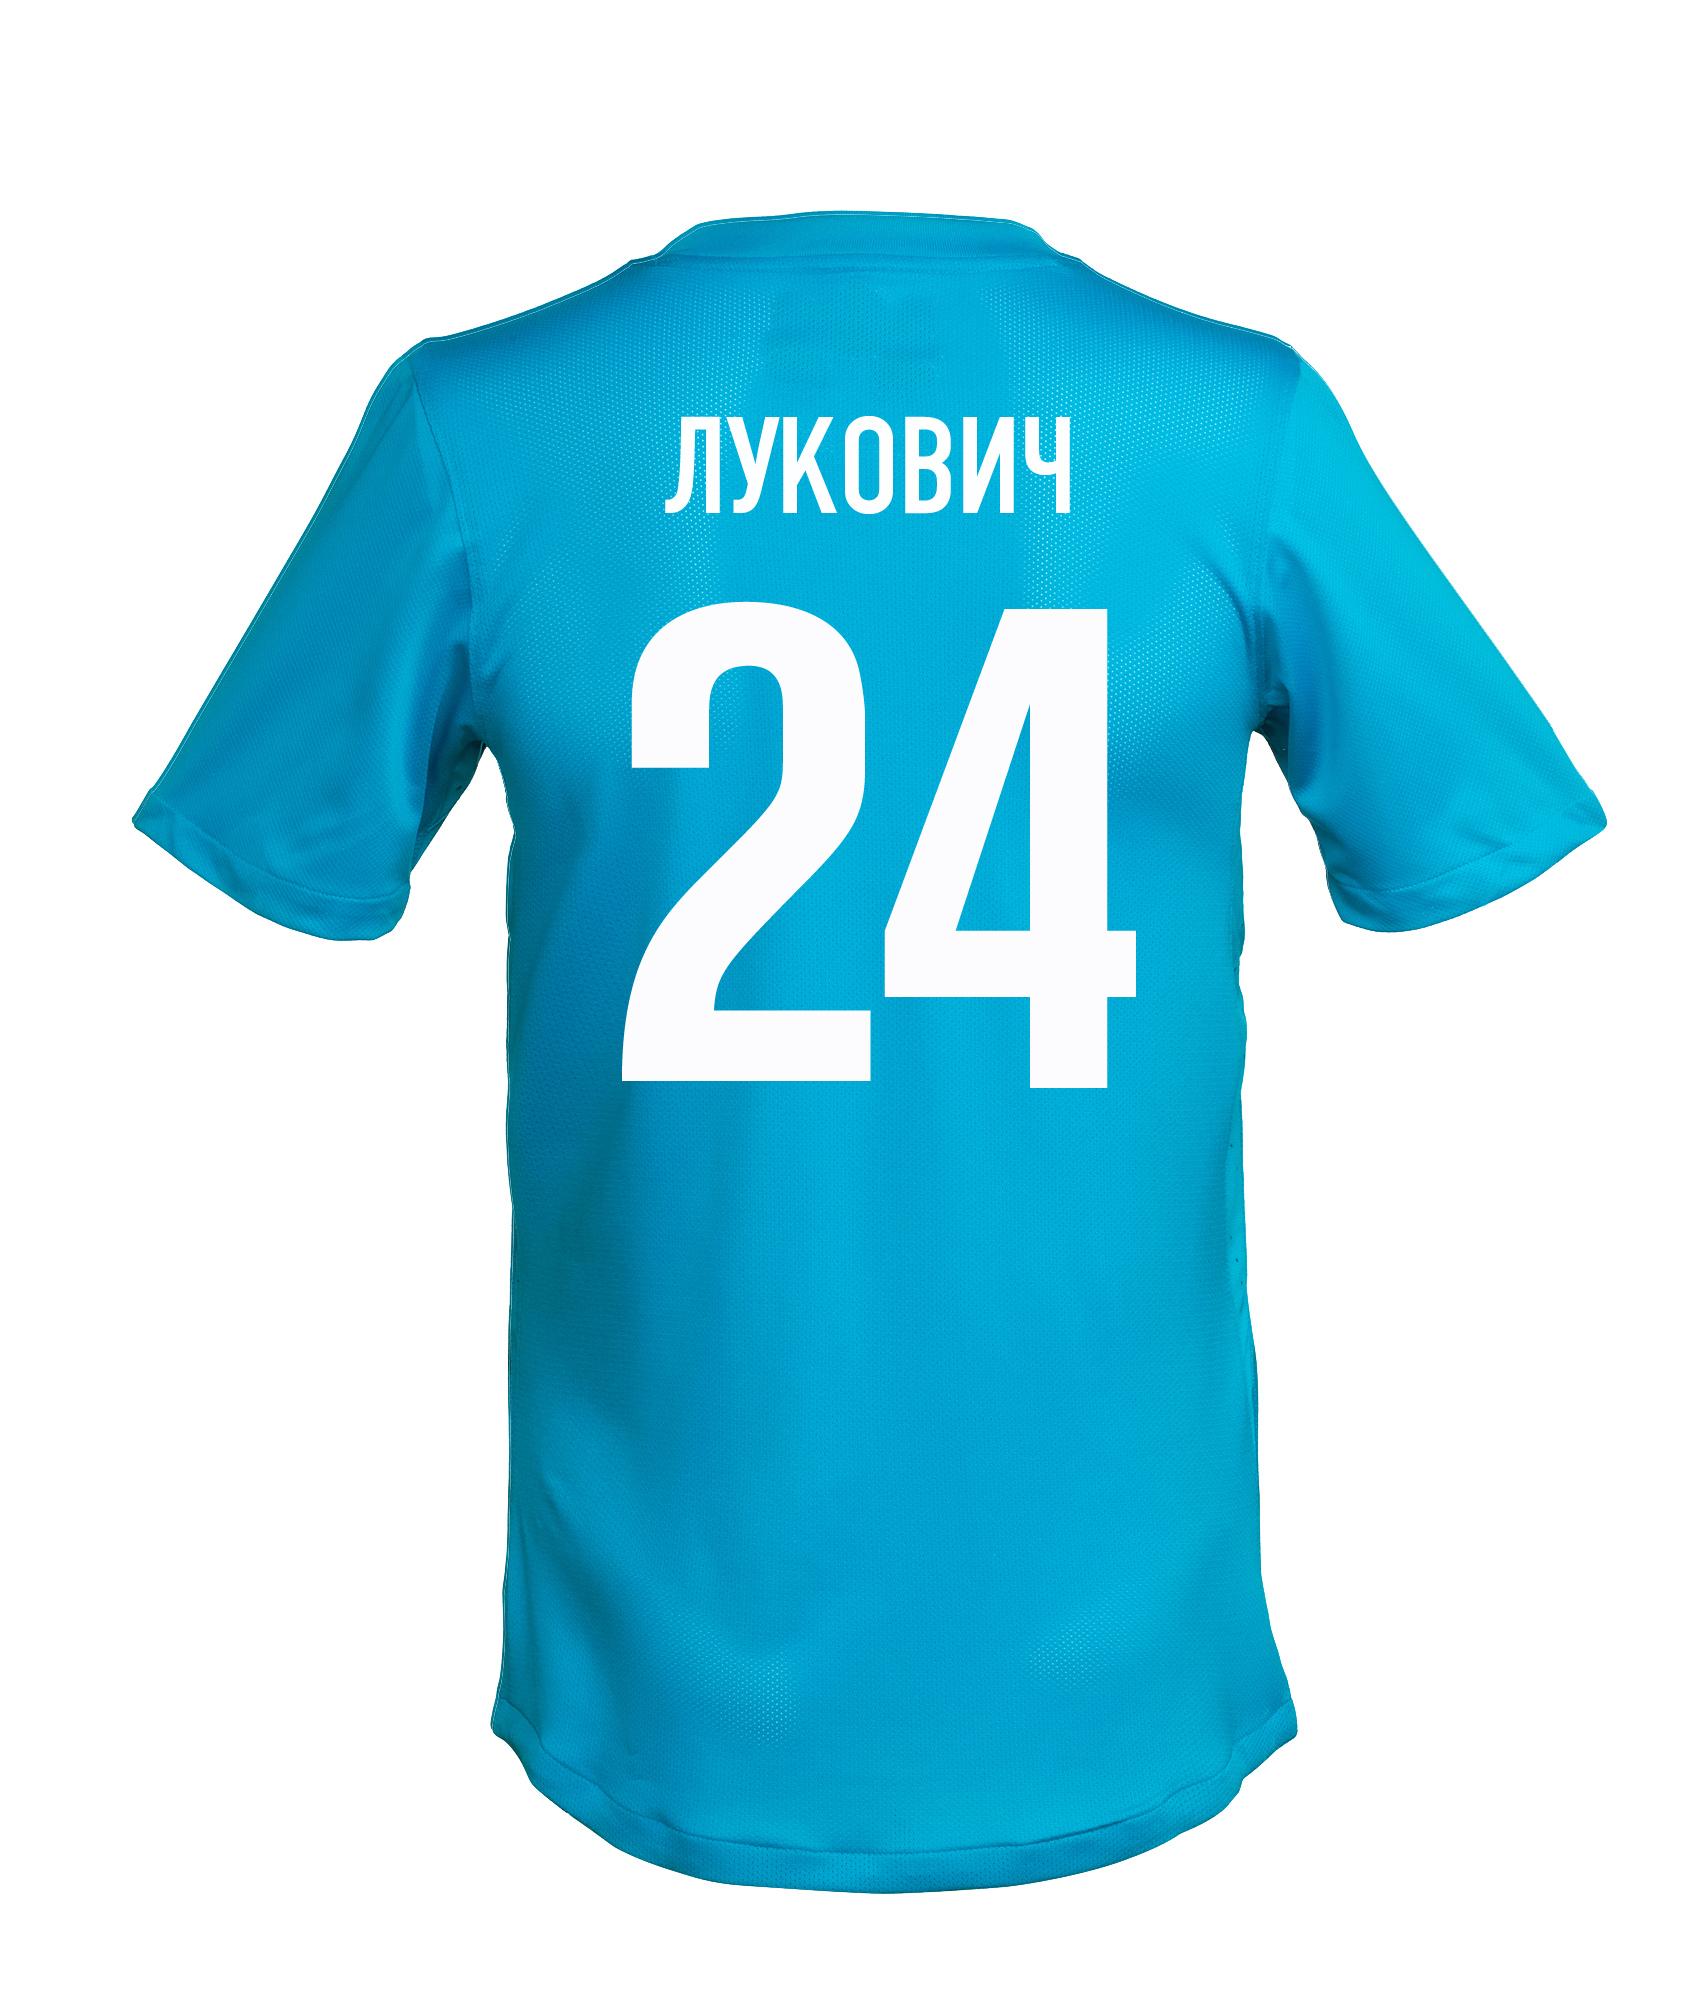 Игровая футболка с фамилией и номером А. Луковича, Цвет-Синий, Размер-L